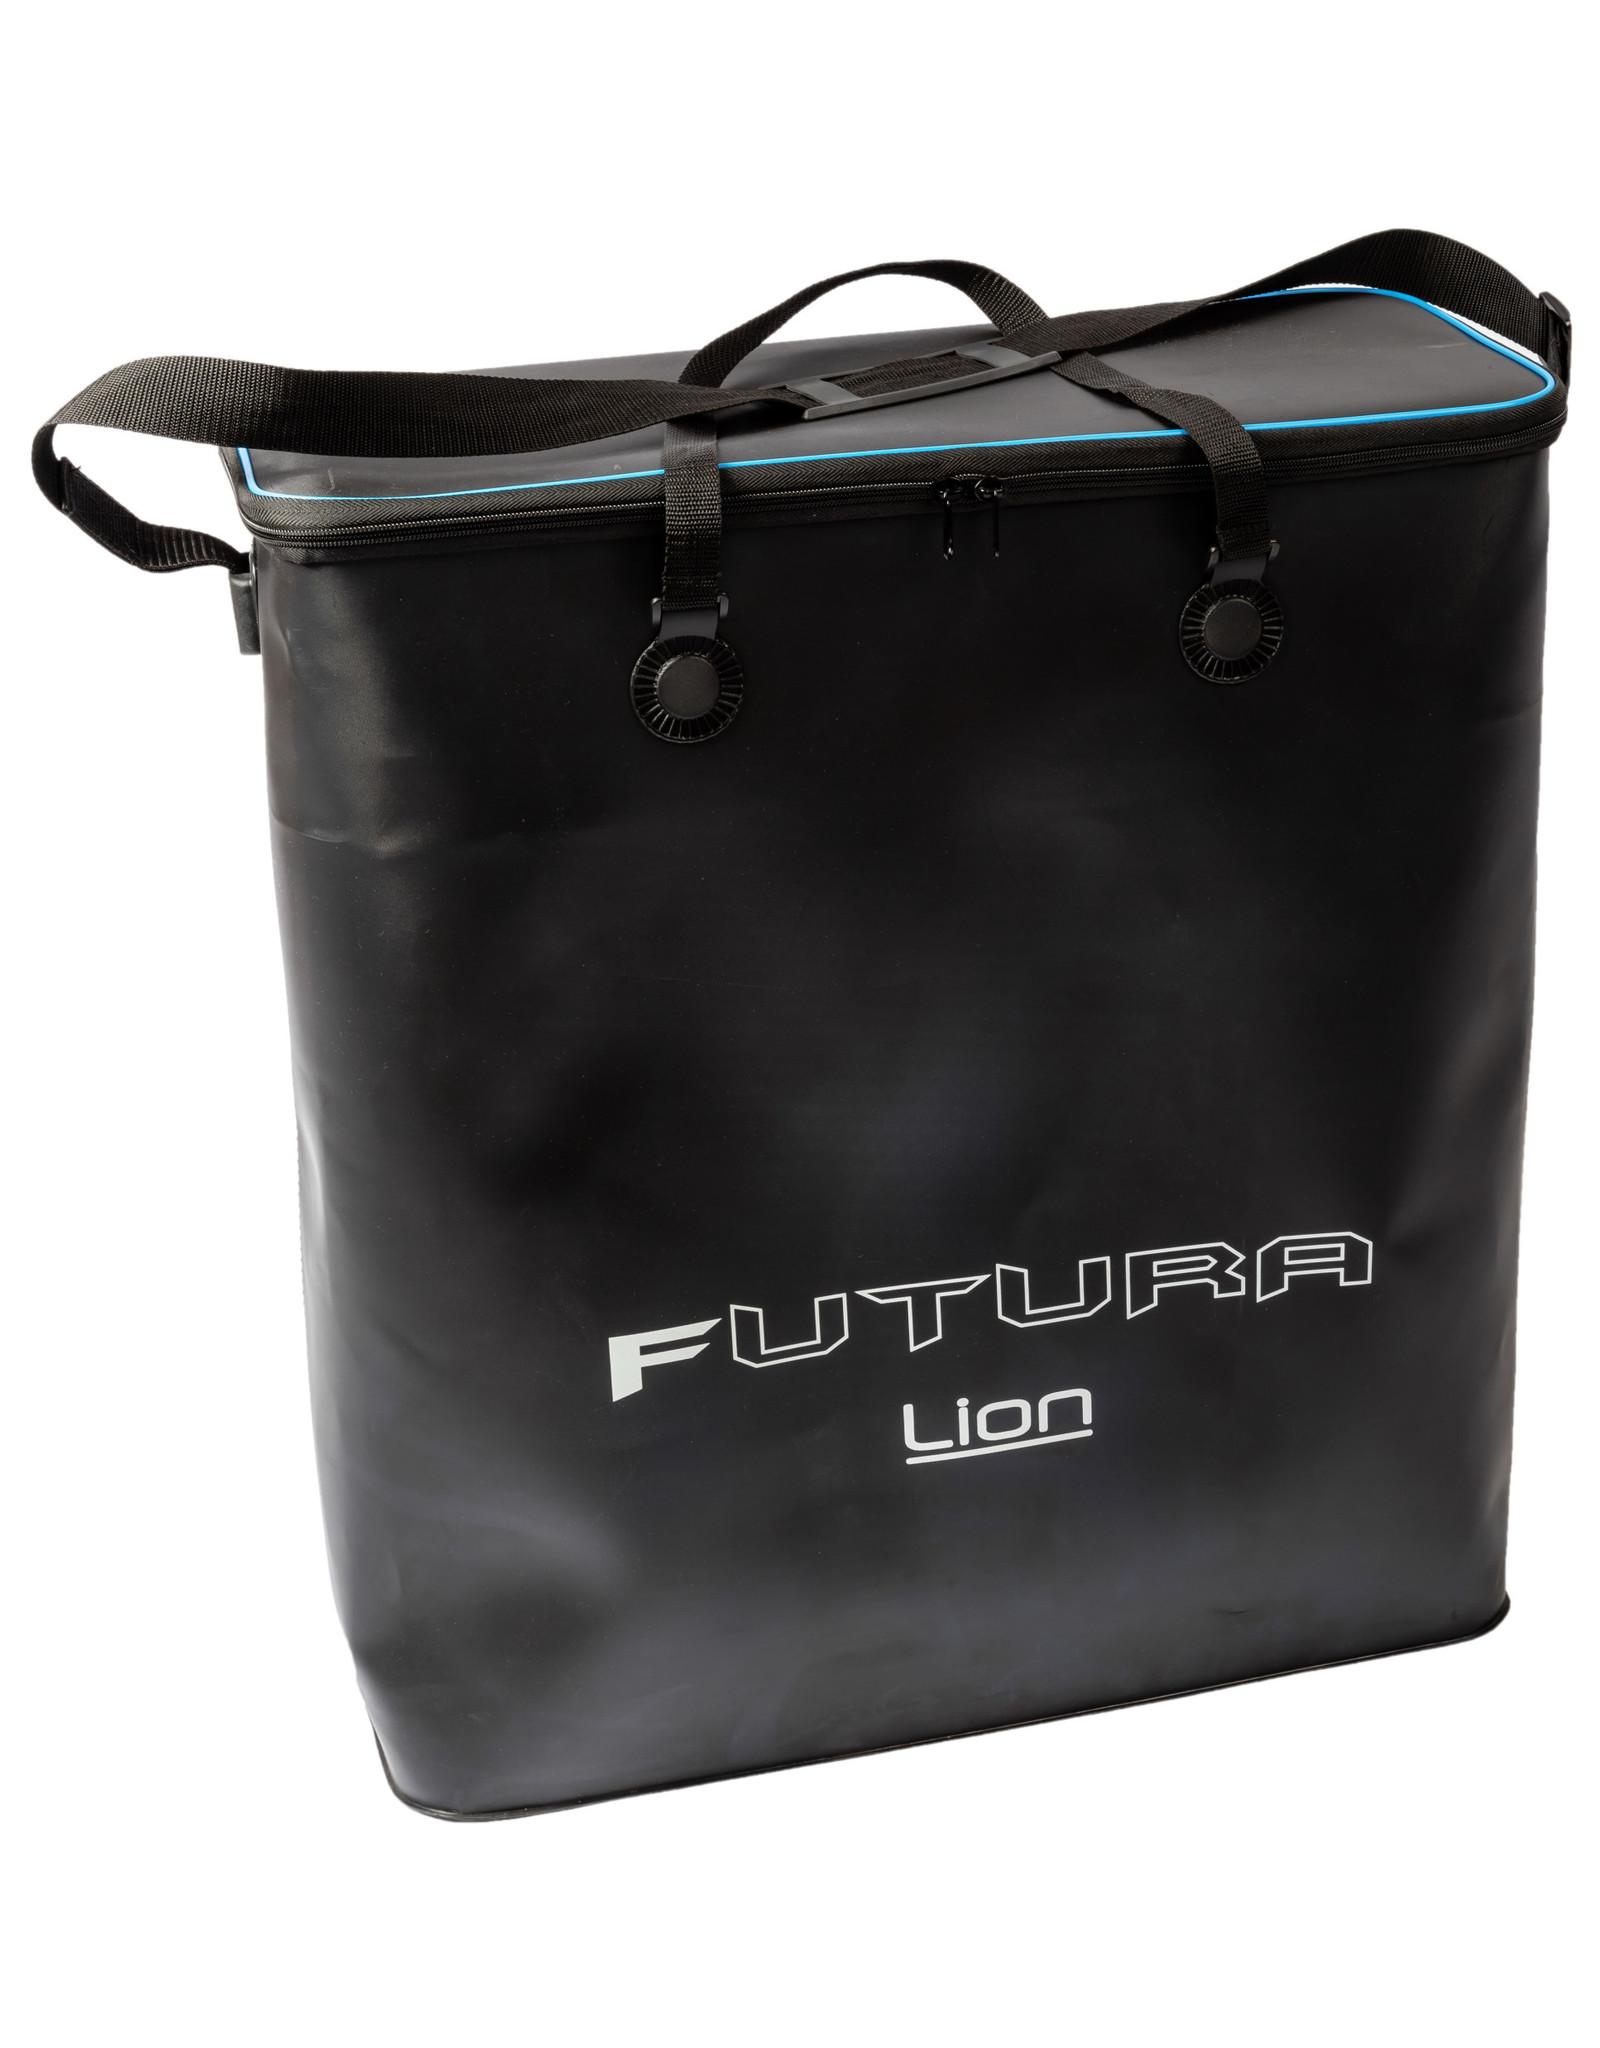 LION Futura EVA Keepnet Bag XL